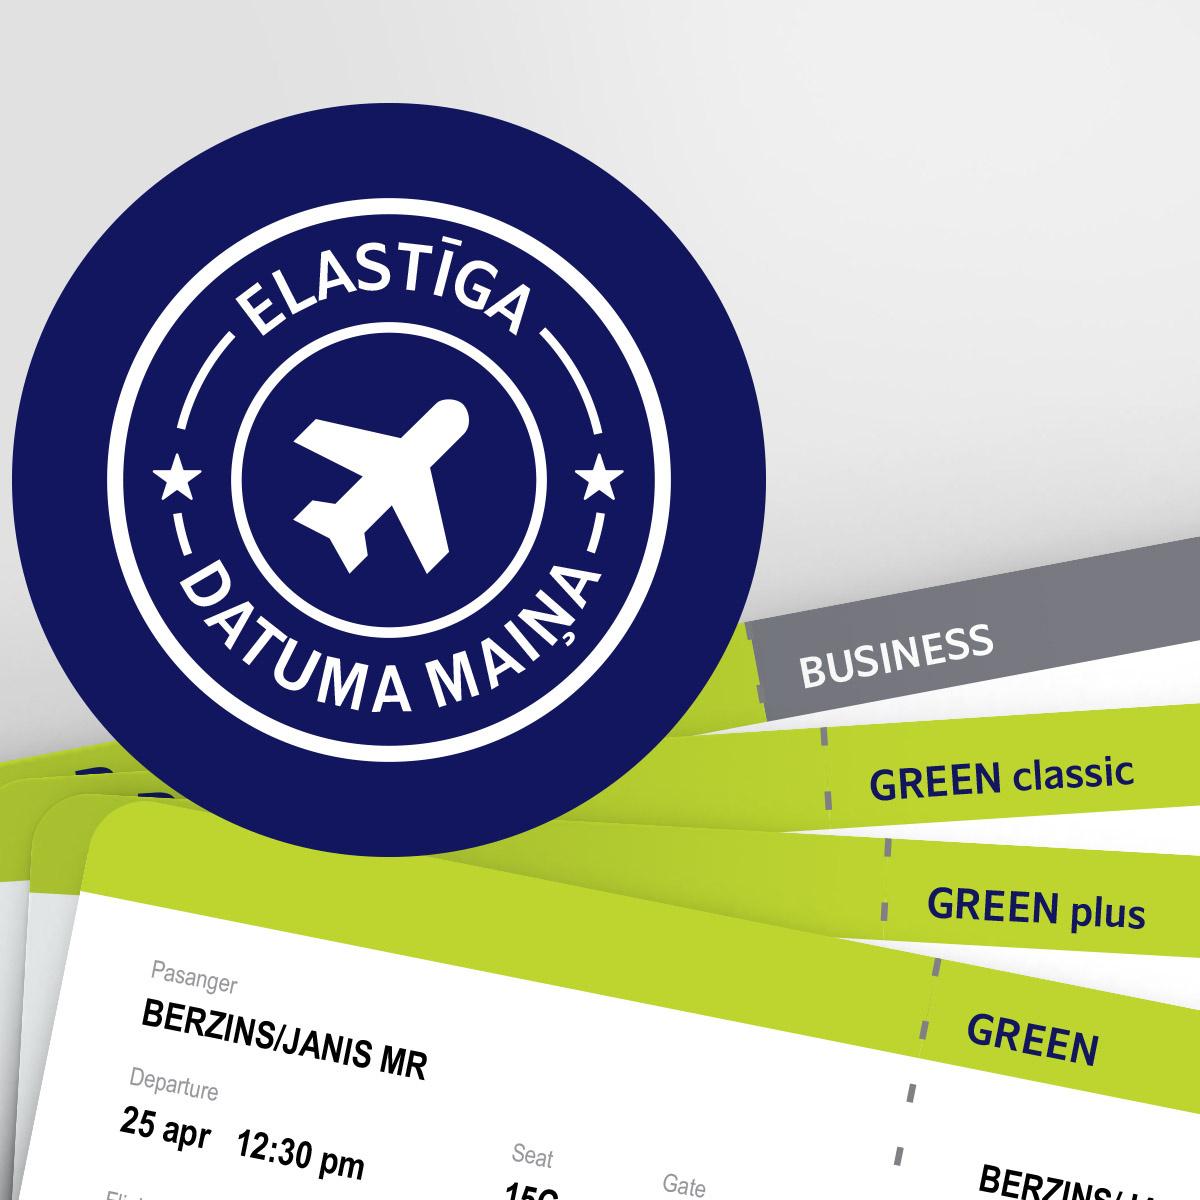 Jauni airBaltic biļešu veidi, jauni pins bonusi! image